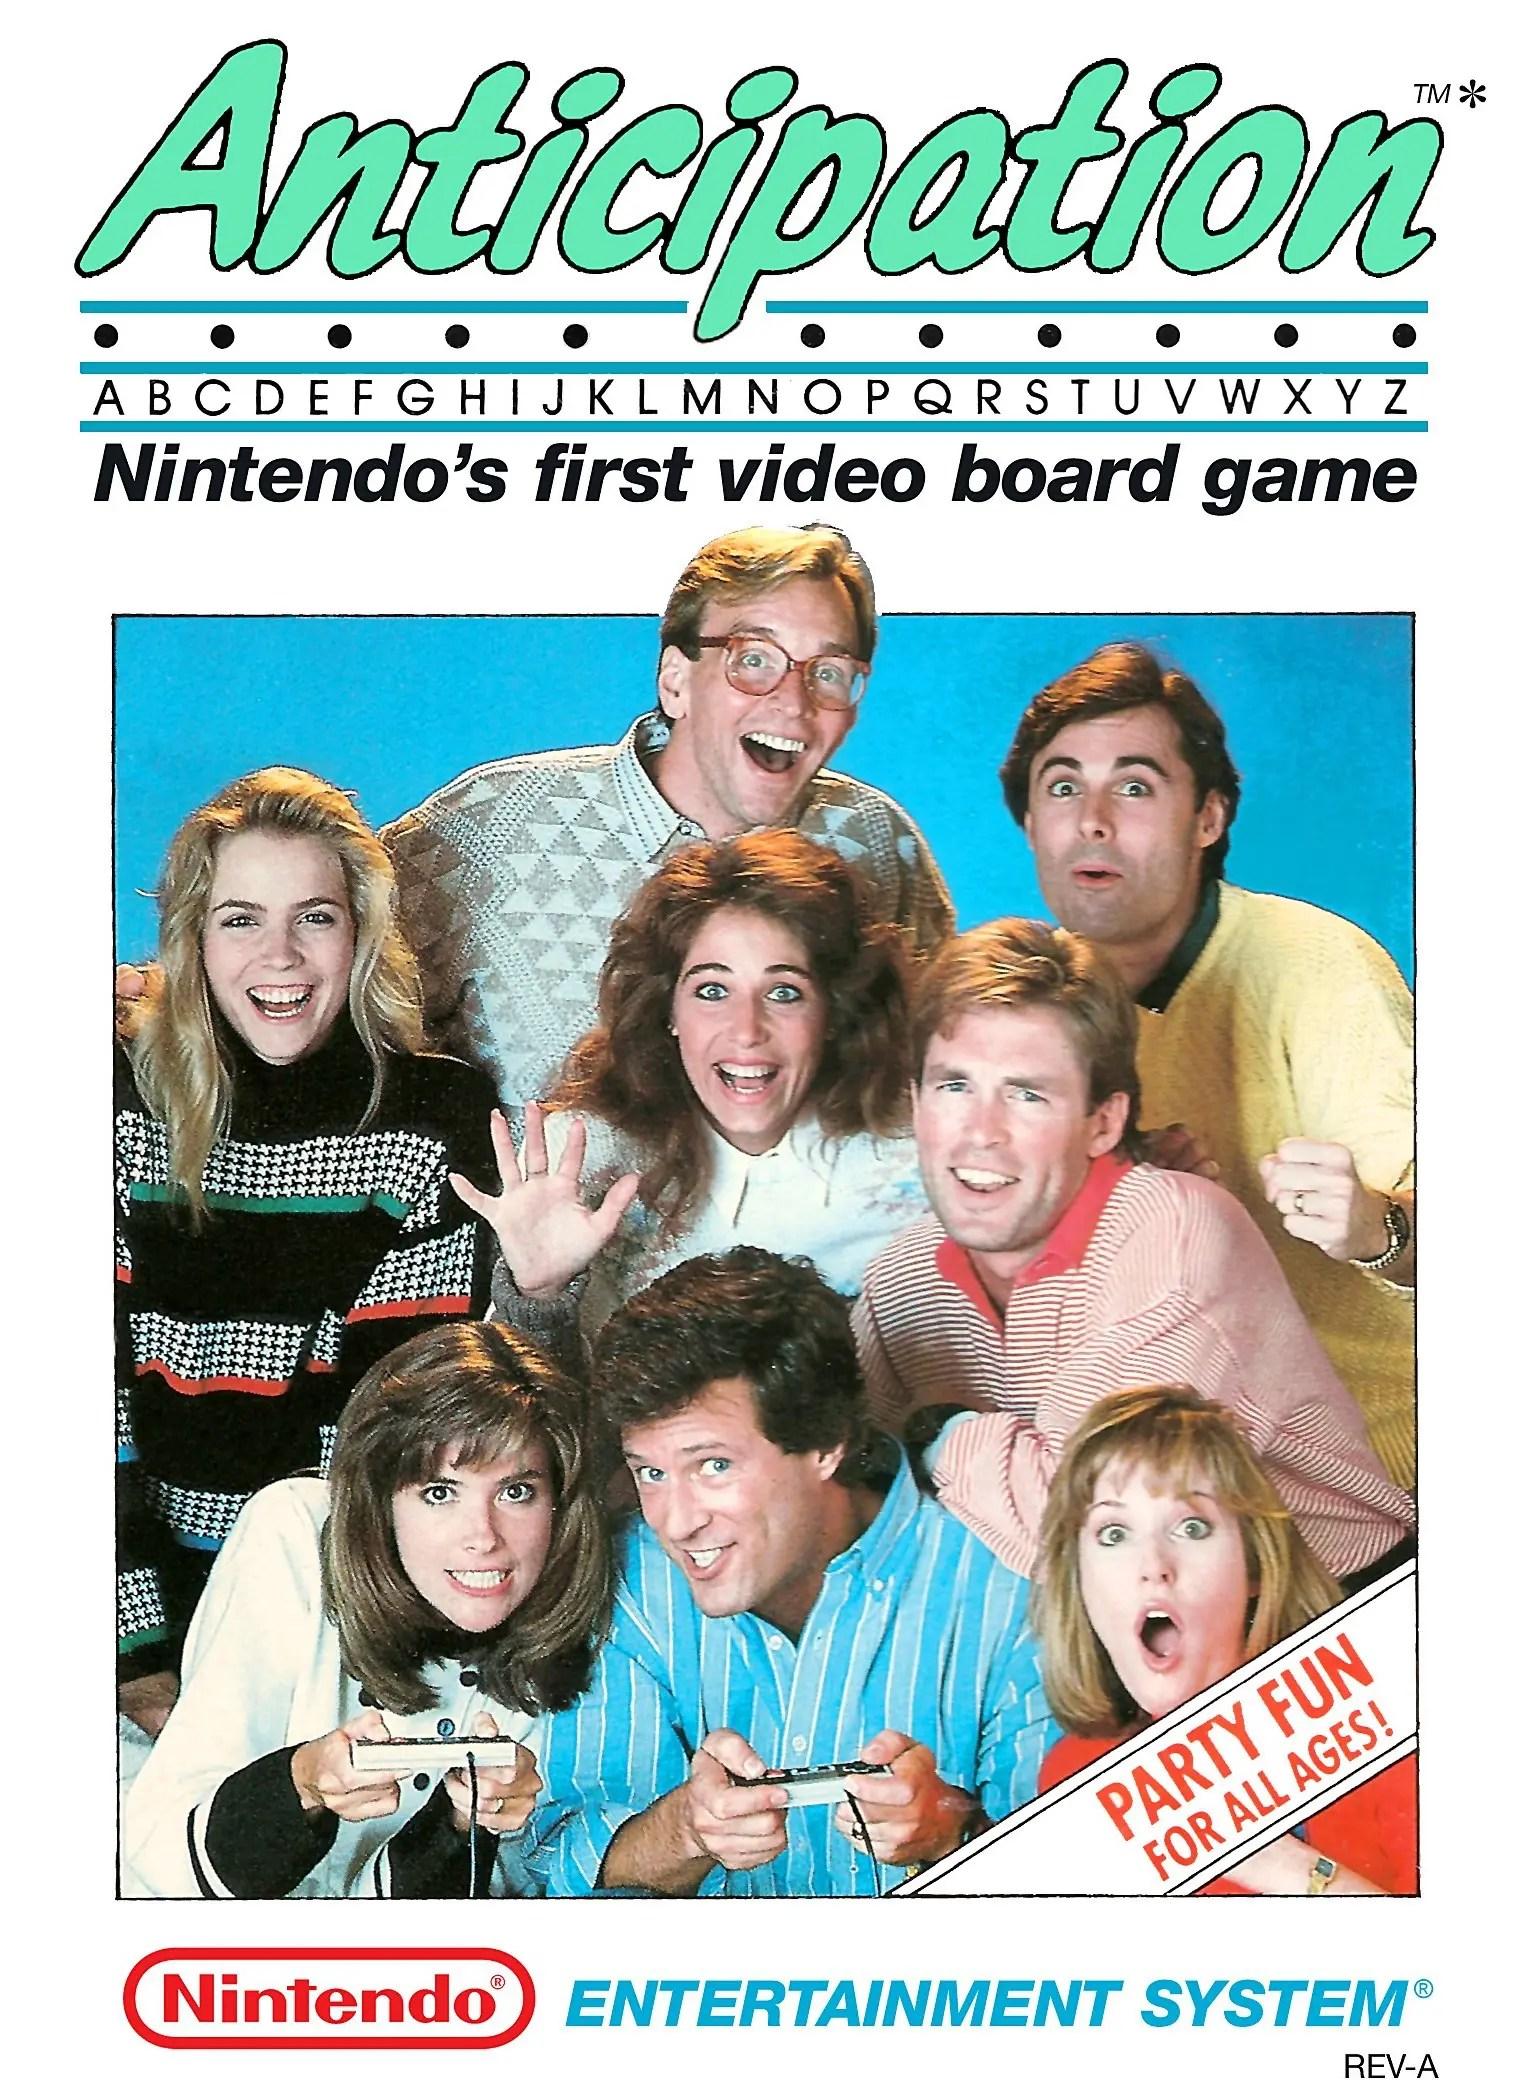 Anticipation for Nintendo Entertainment System (NES)